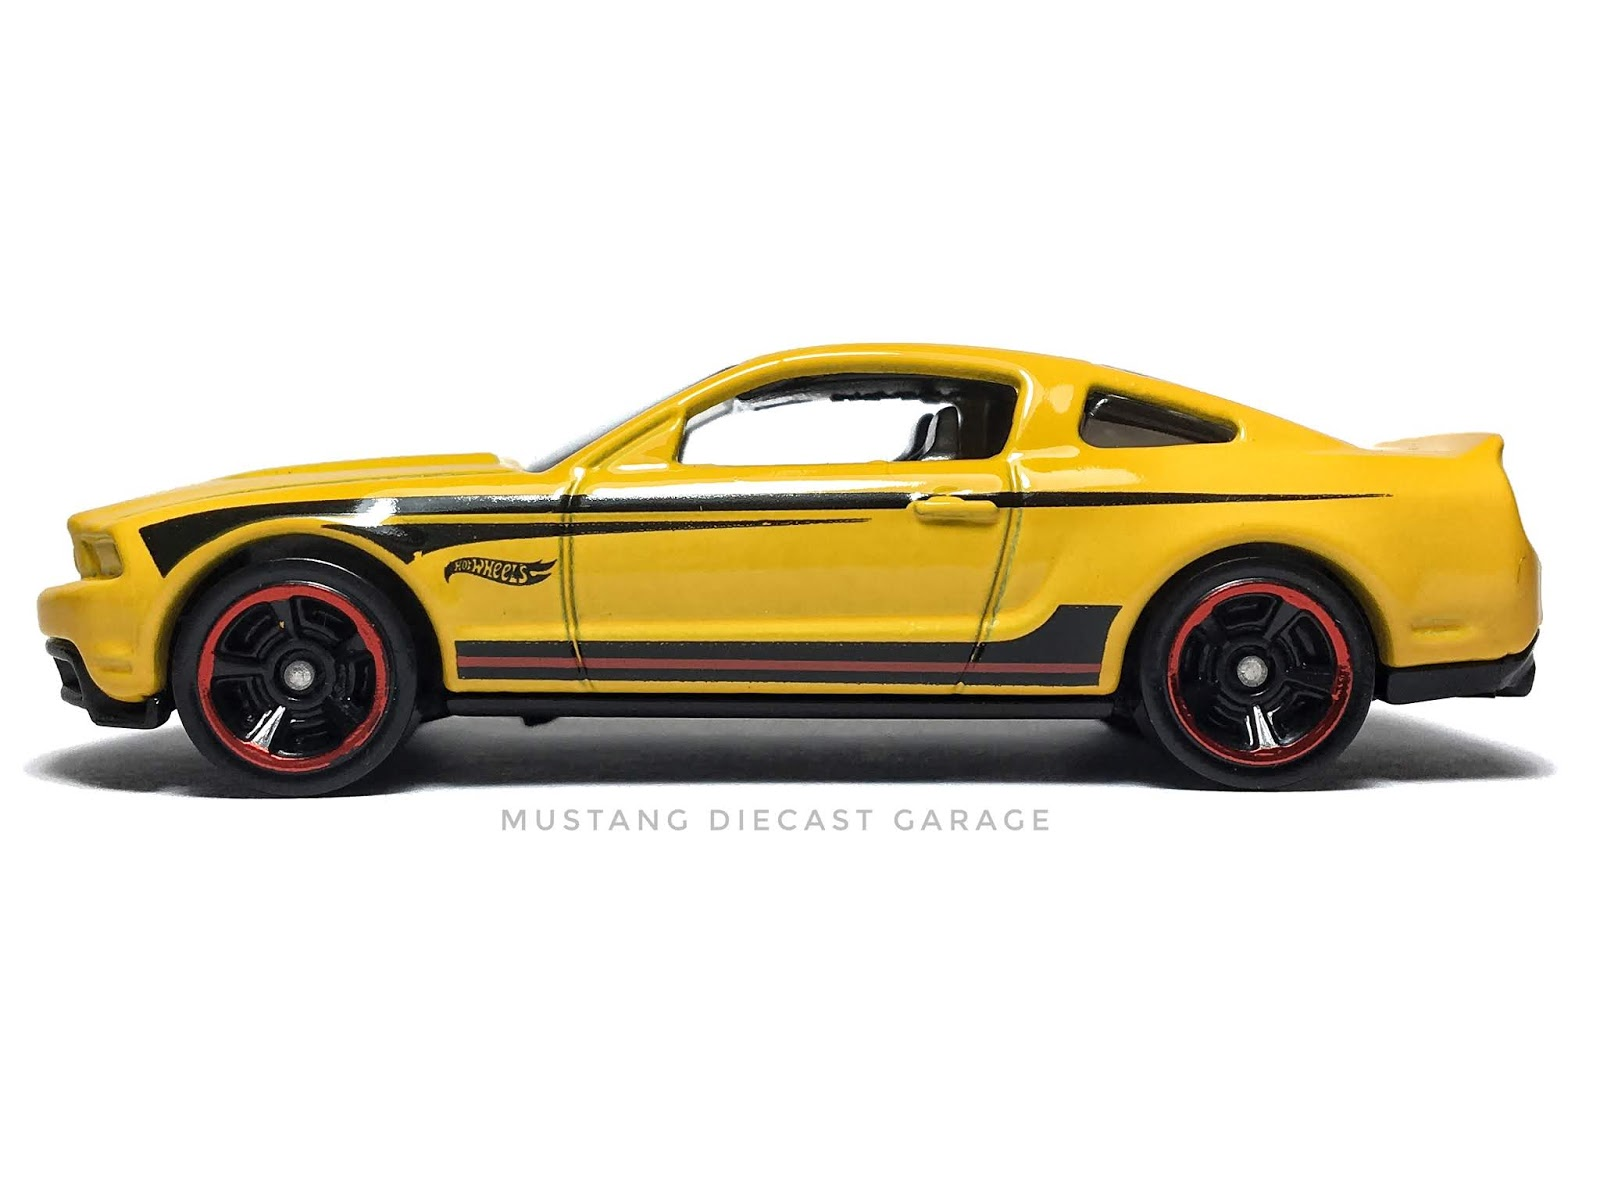 Hot Wheels 2010 Ford Mustang GT Series 2016 HW Mild to Wild (สีเหลือง) 1:64